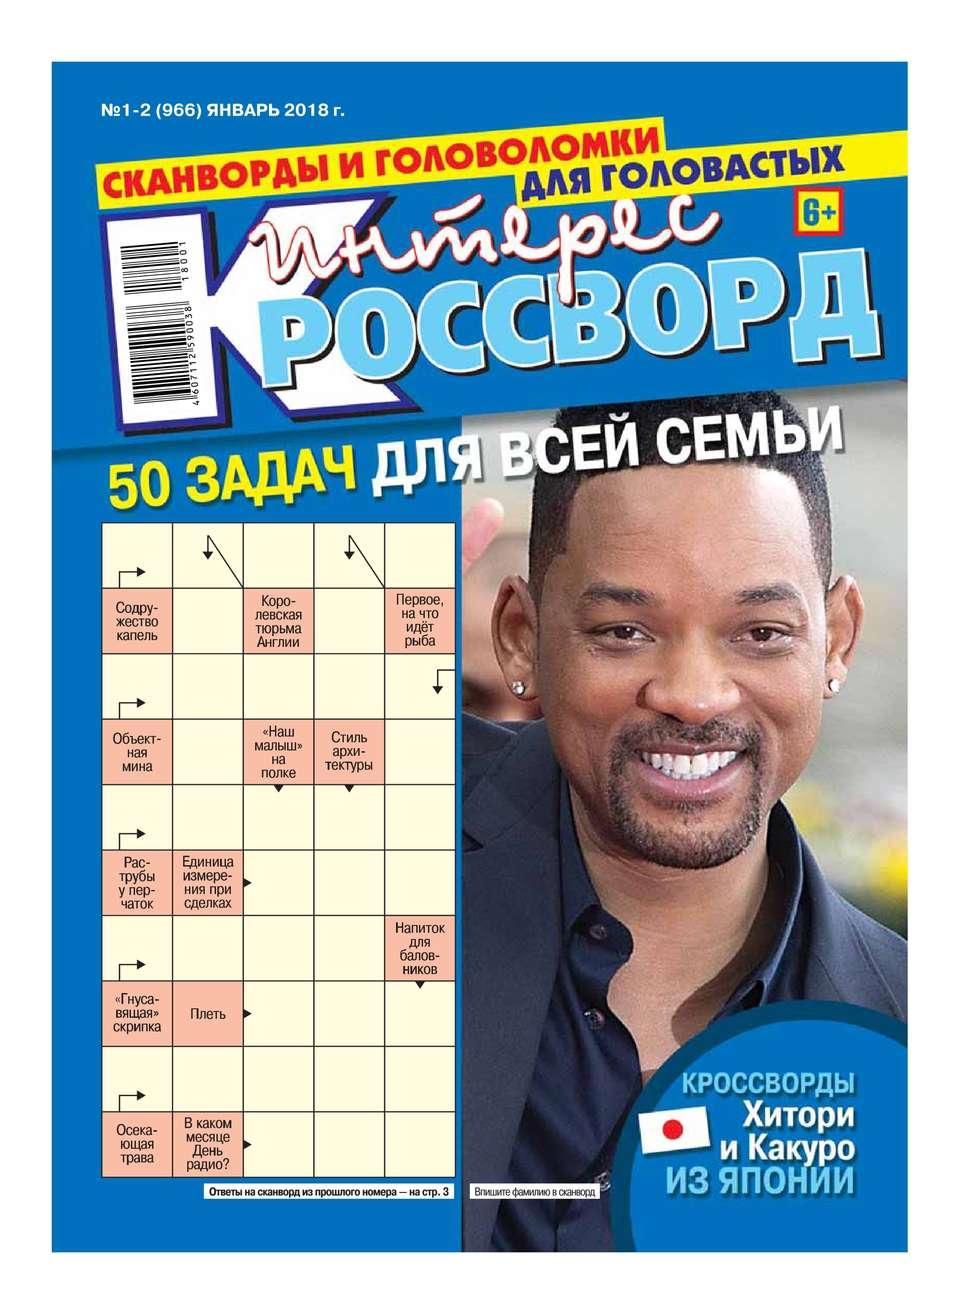 Интерес-кроссворд 01-02-2018